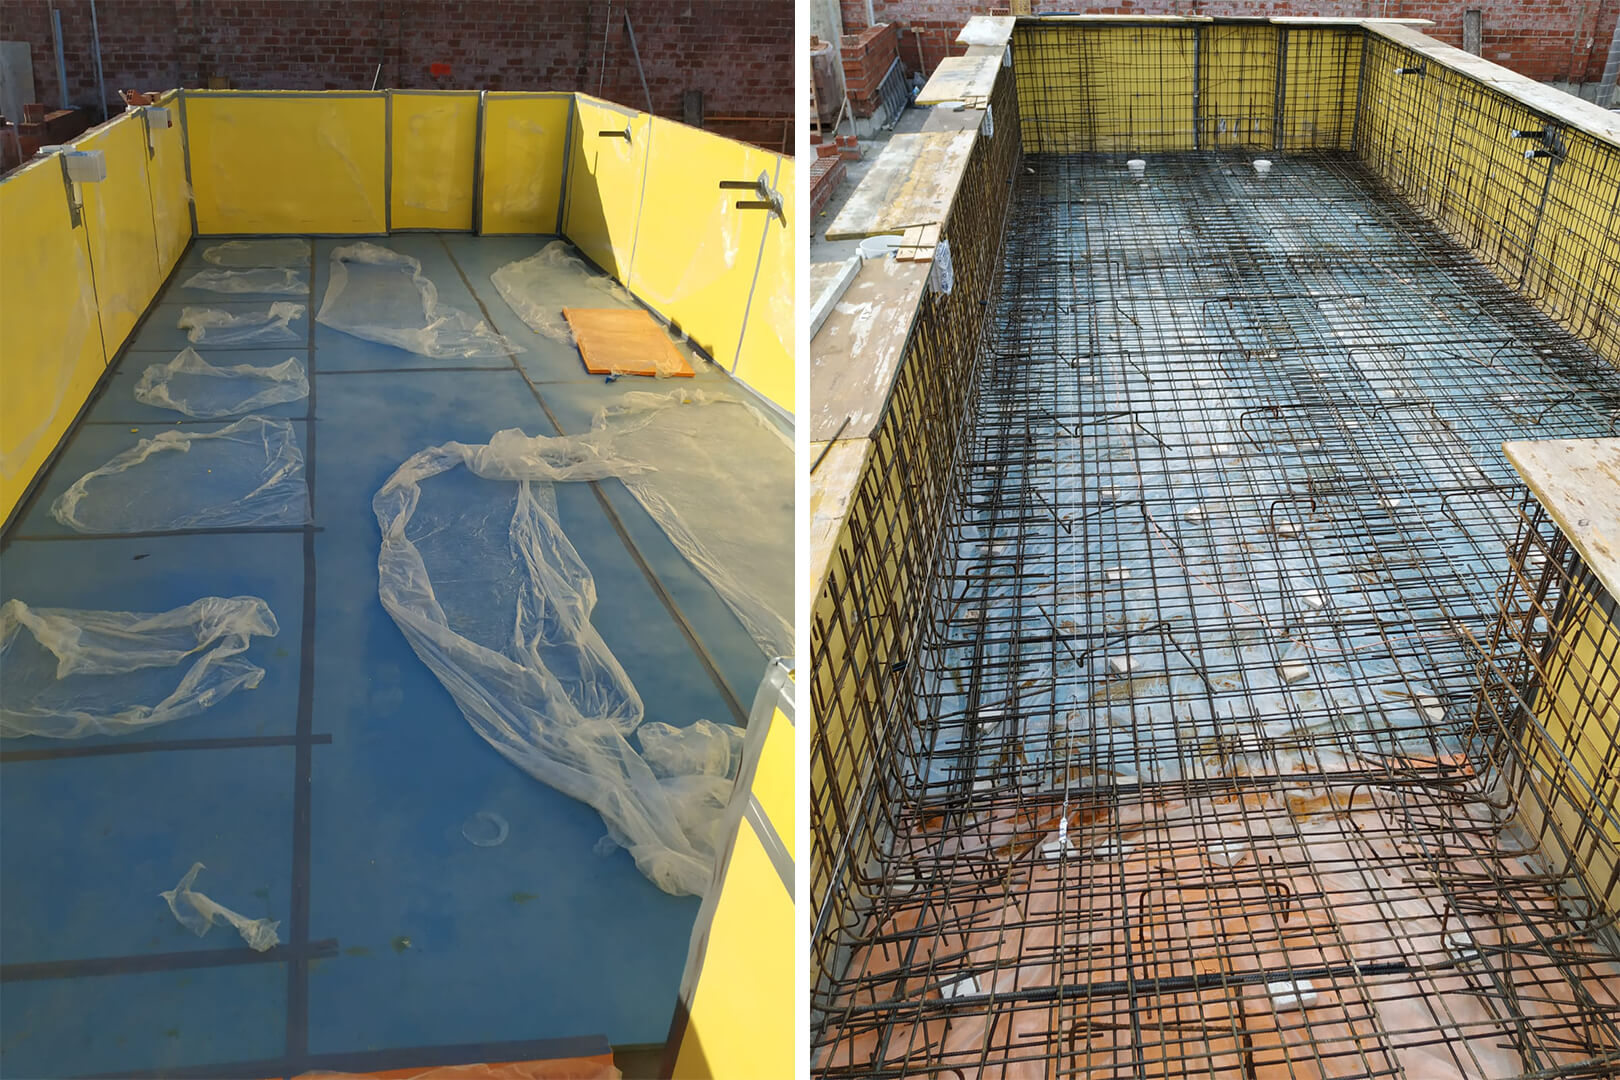 rooftop-pool-insulation-8.jpg